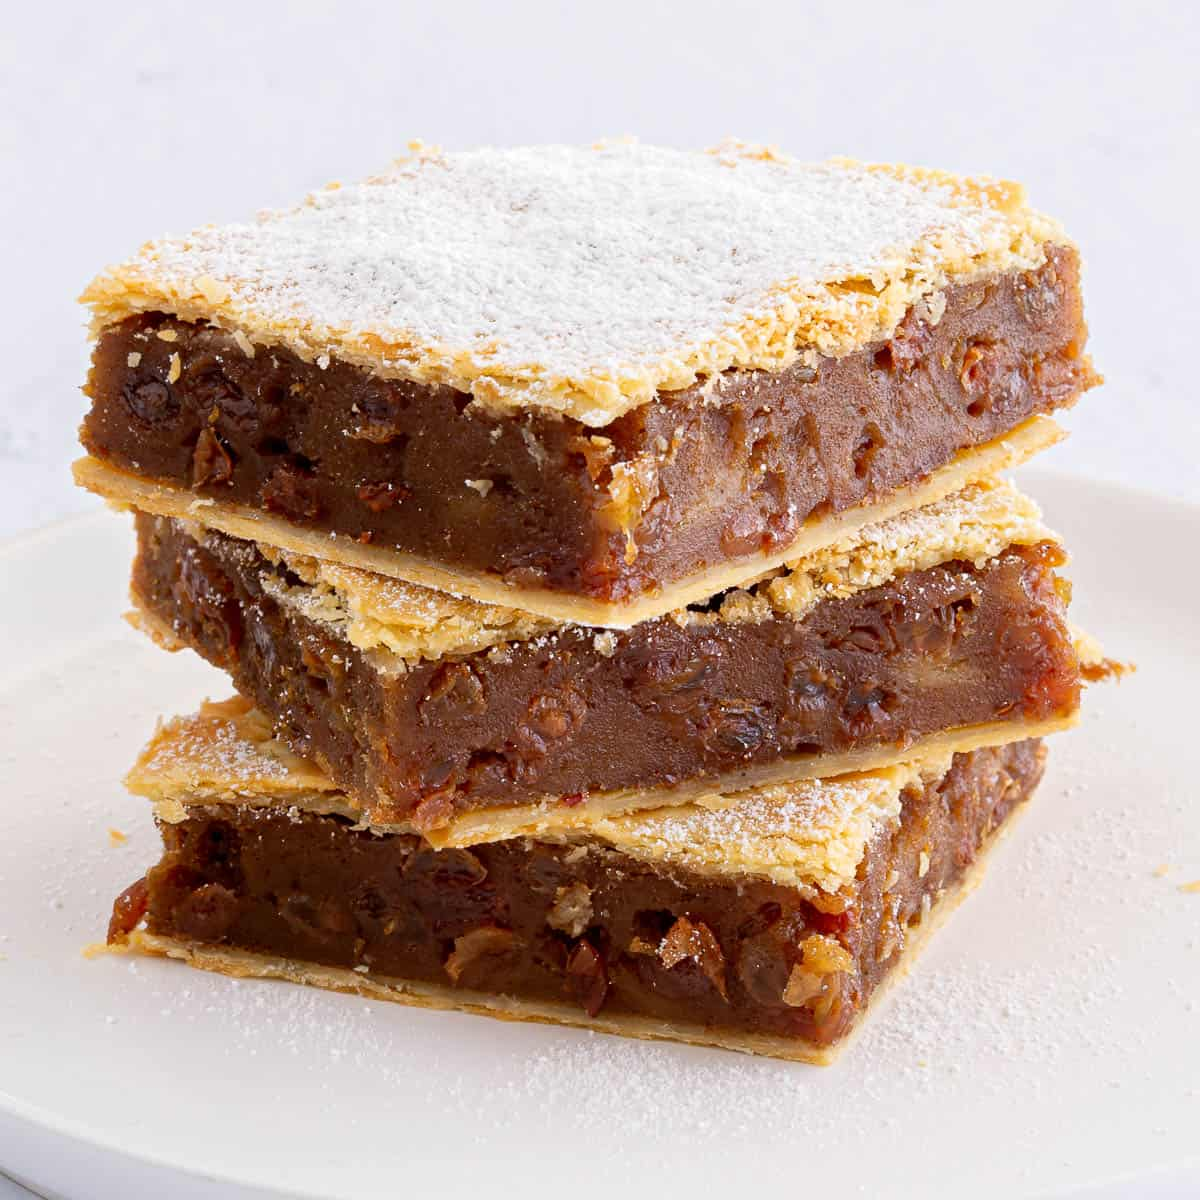 Stack of three slices of gur cake.